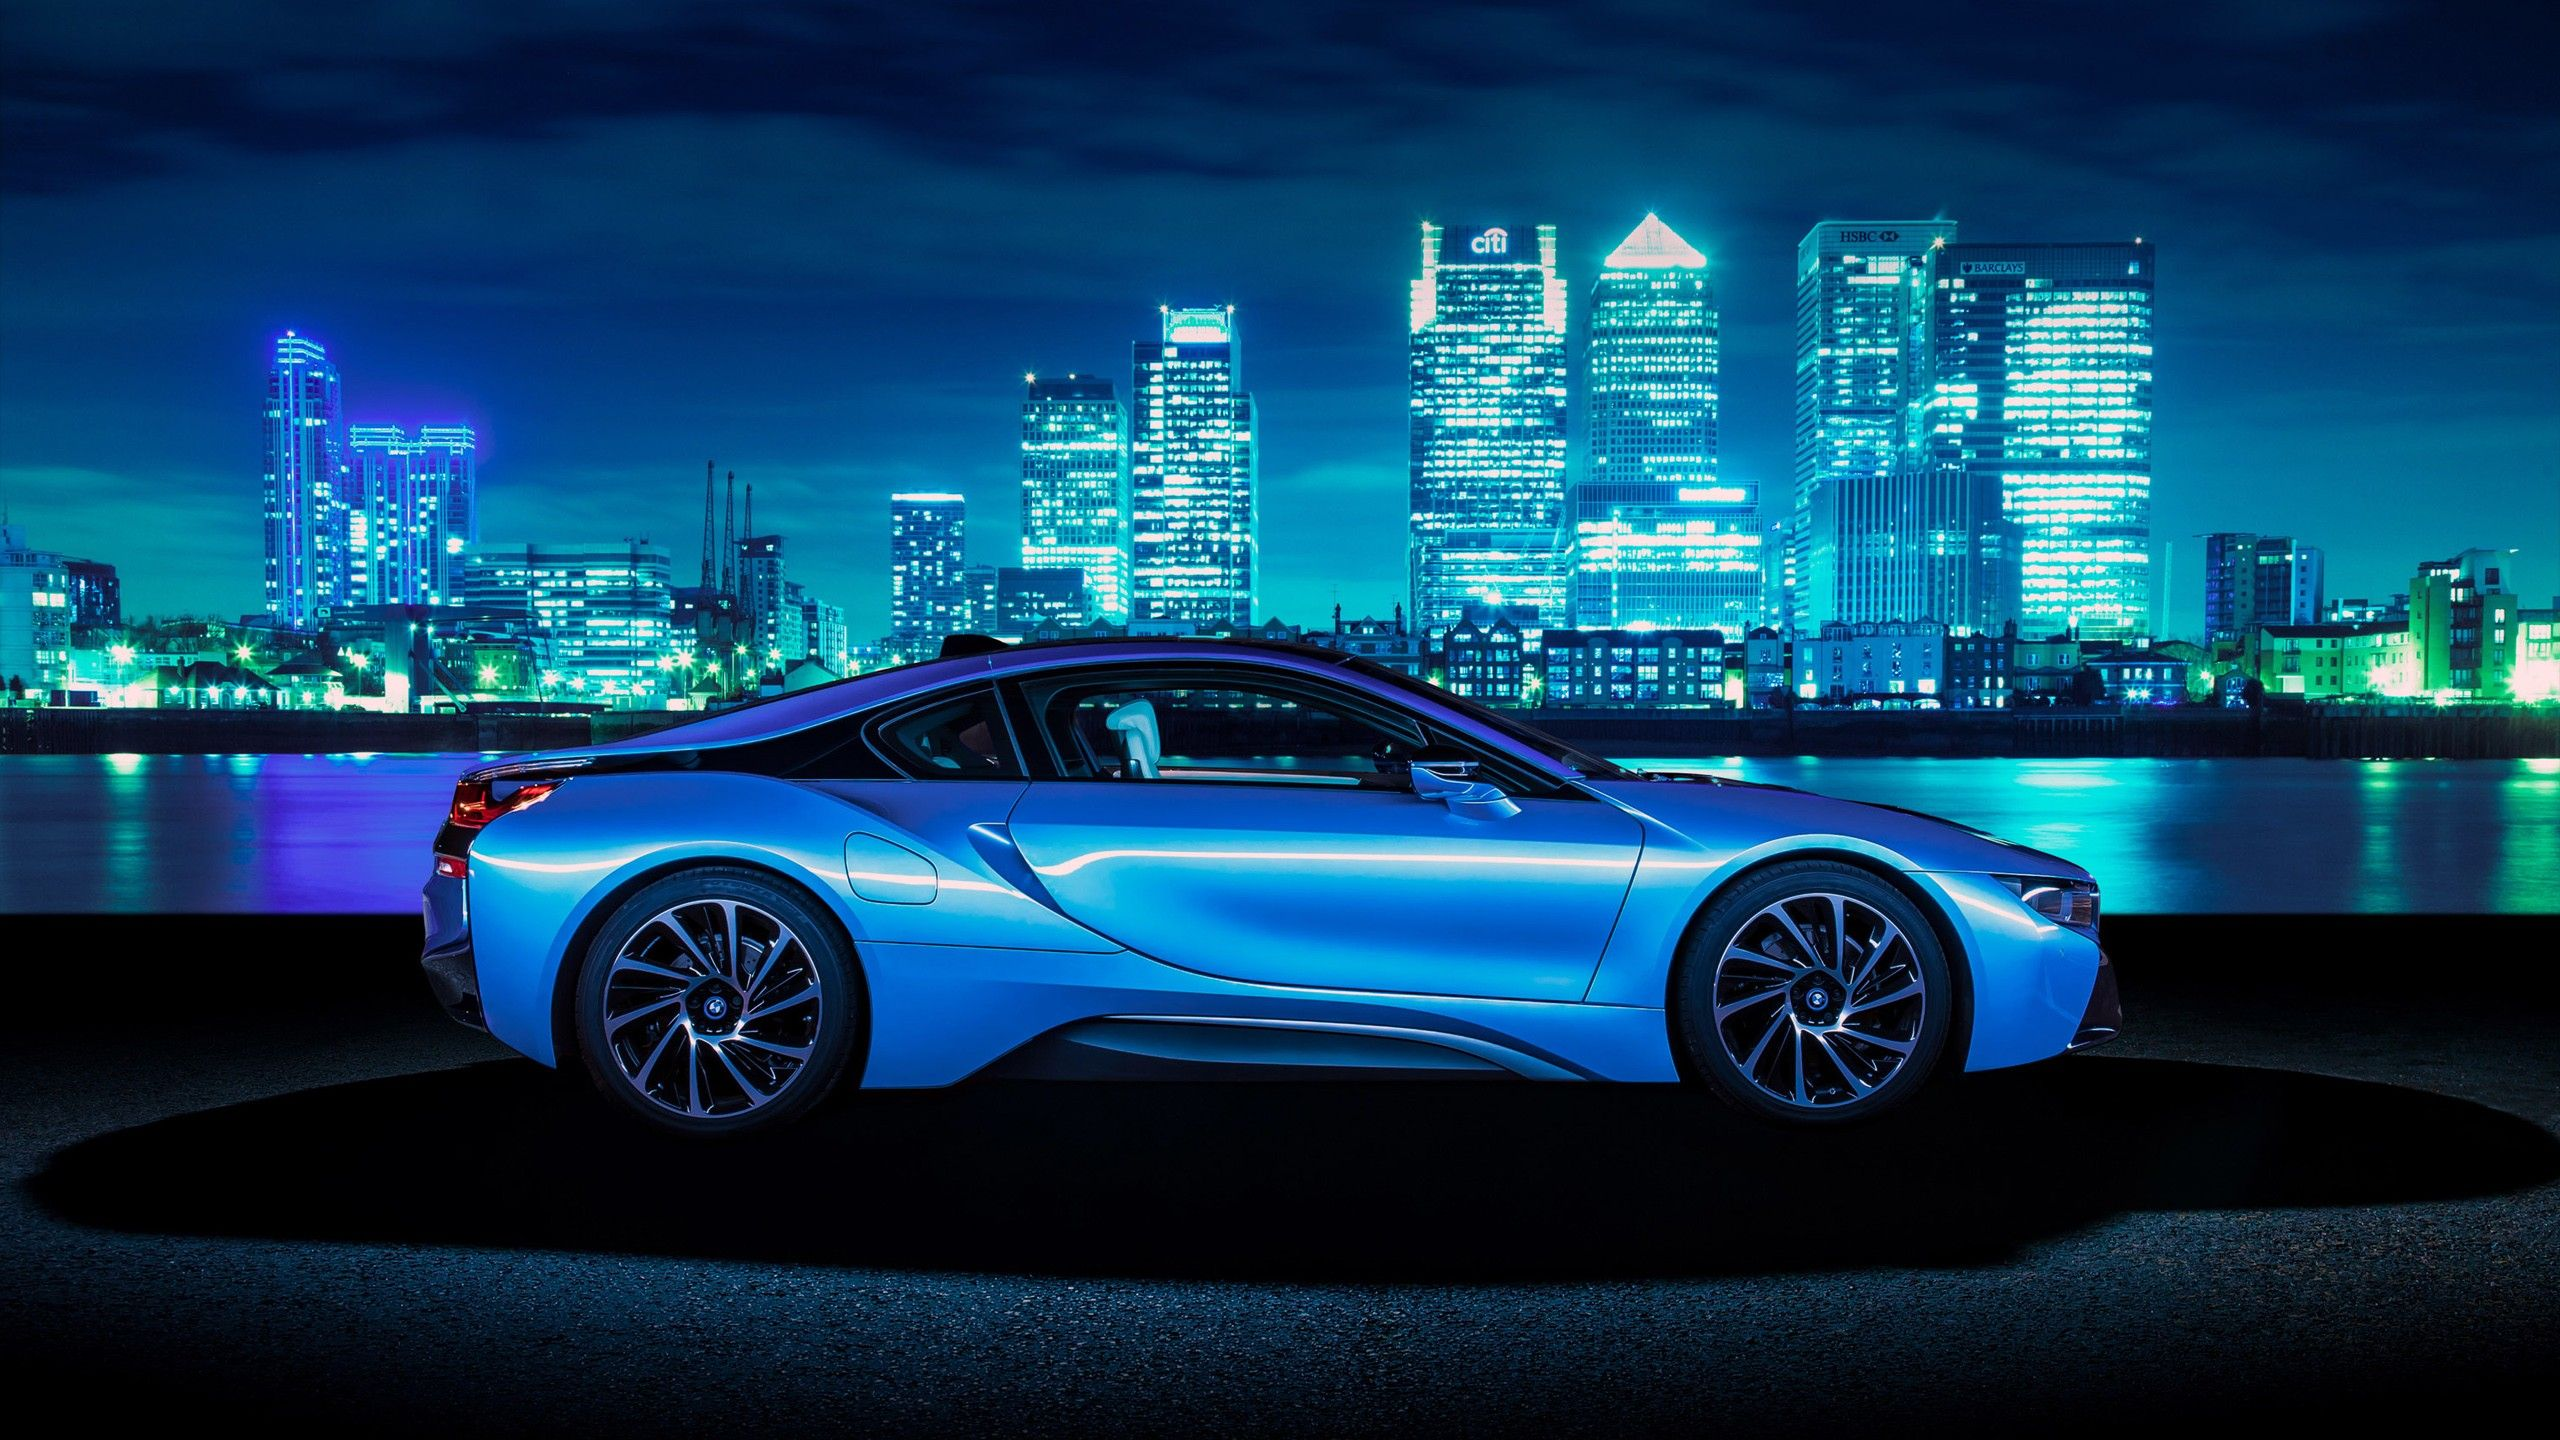 56 Best Free Luxury Cars Desktop Wallpapers Wallpaperaccess